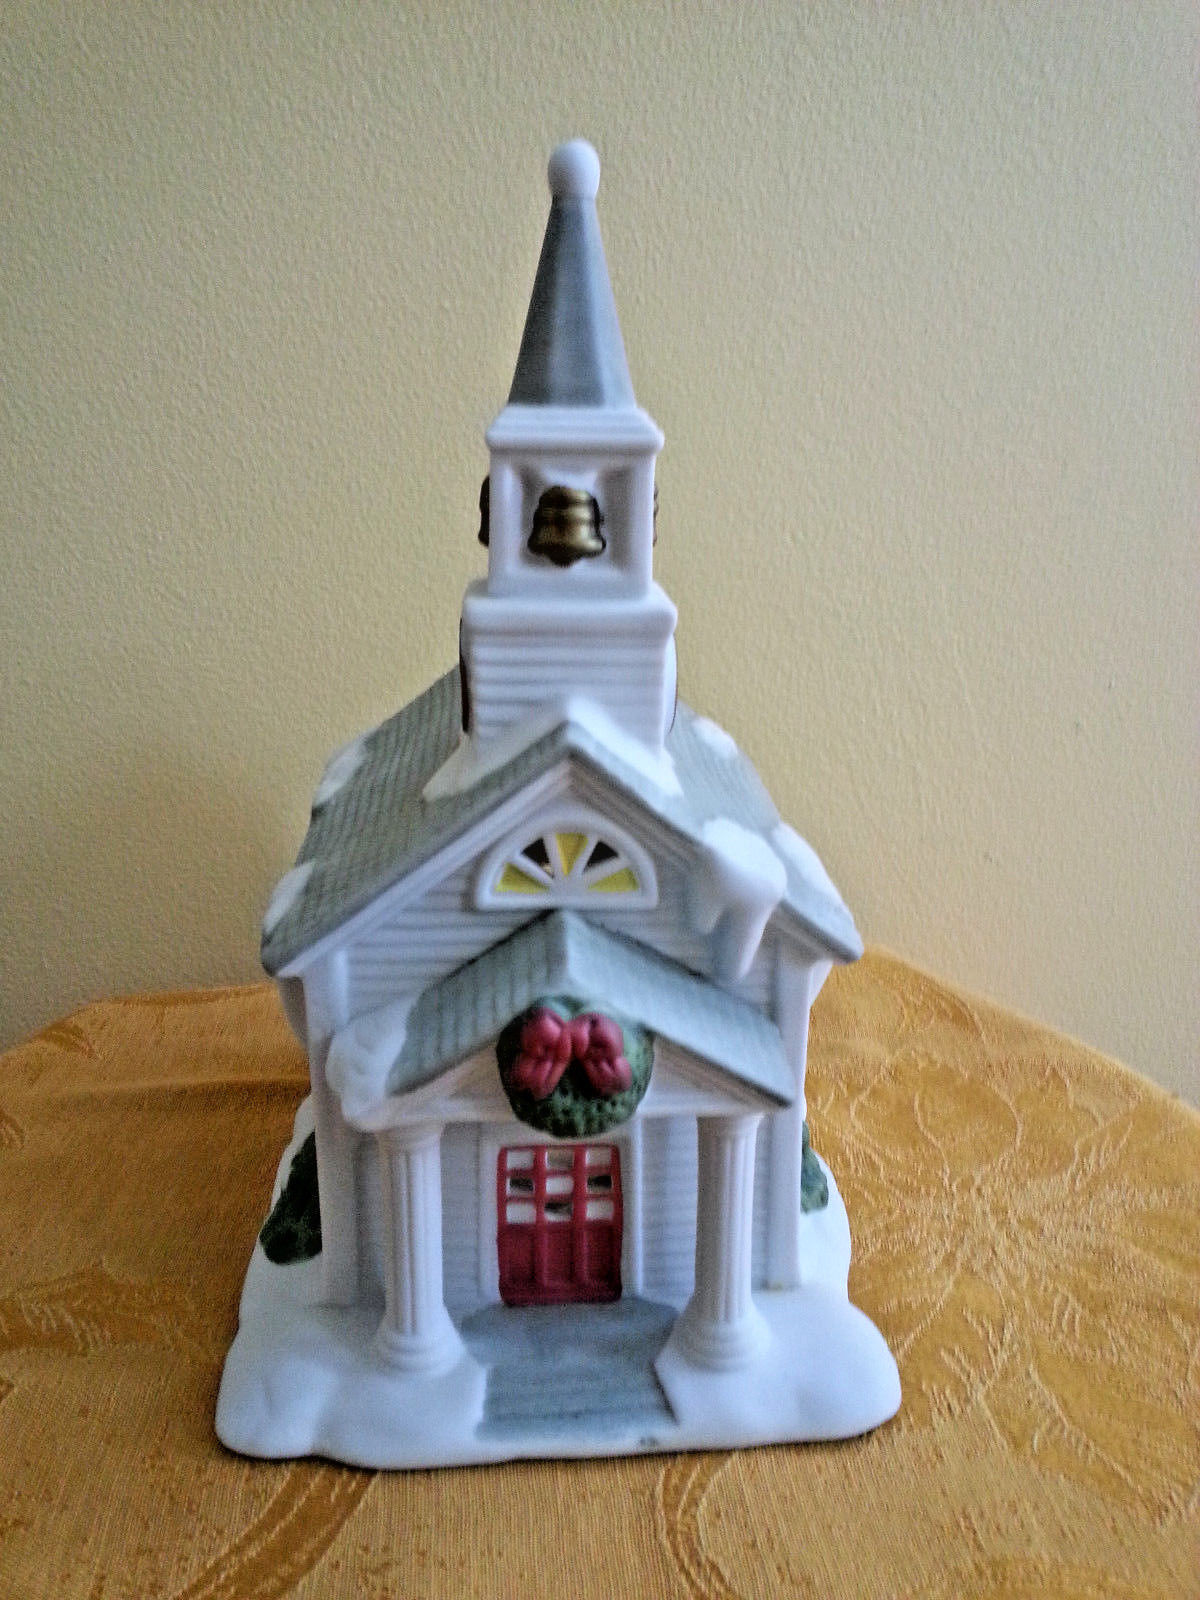 Partylite The Church P0428 Winter Village Decor Wreath Snow Original Box Wreath